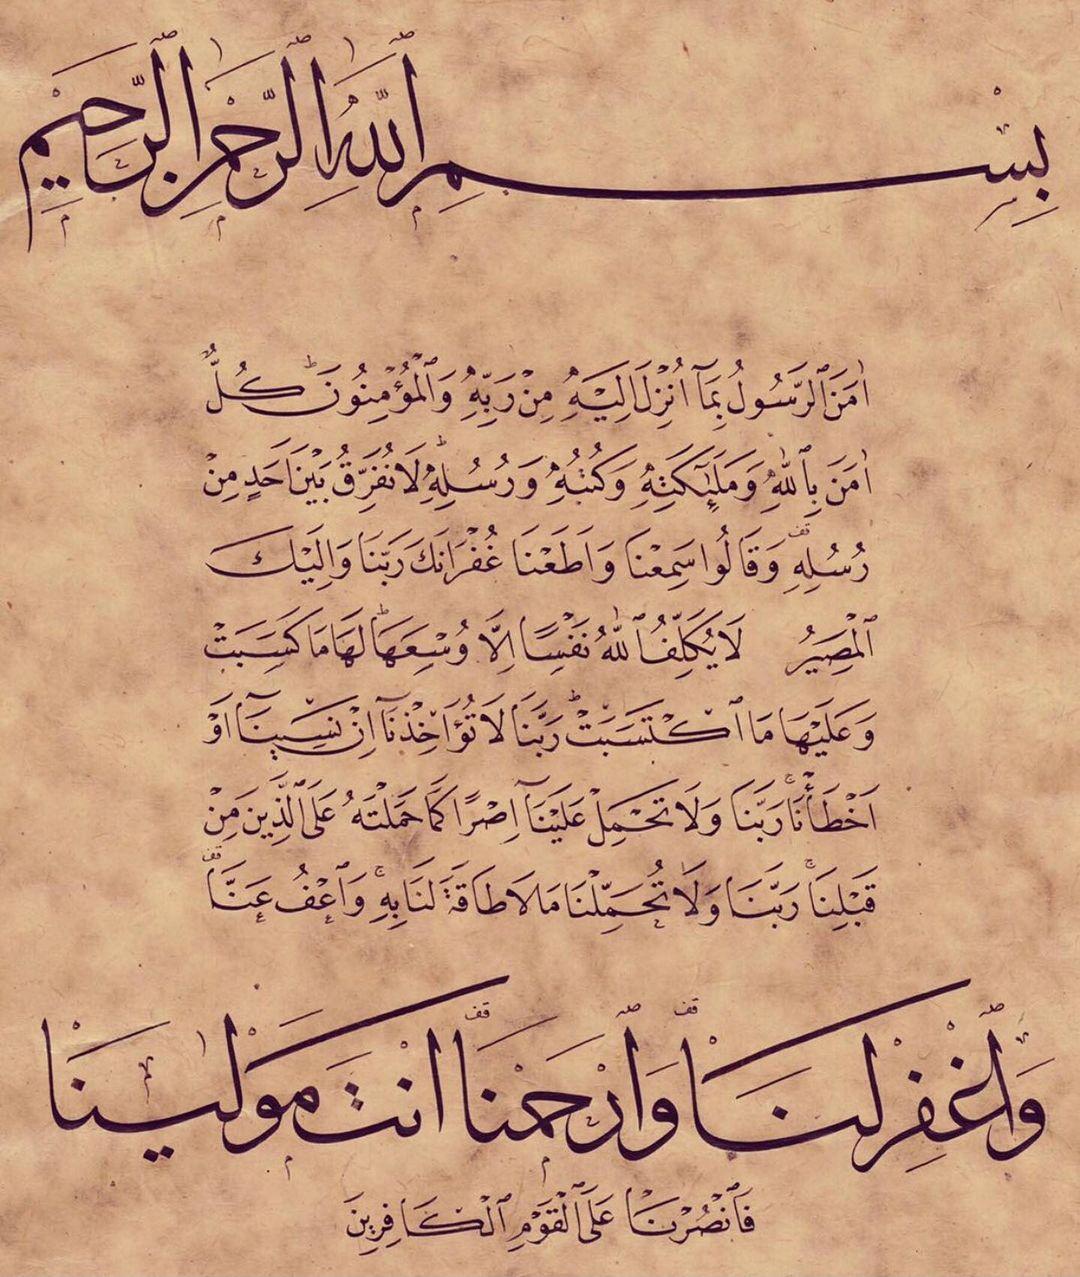 Professional Calligrapher Bijar Arbilly Calligraphy  القران ال #calligraphy #kunst #art #tehran #istanbul #arabic #london #dubai #kuw… 98